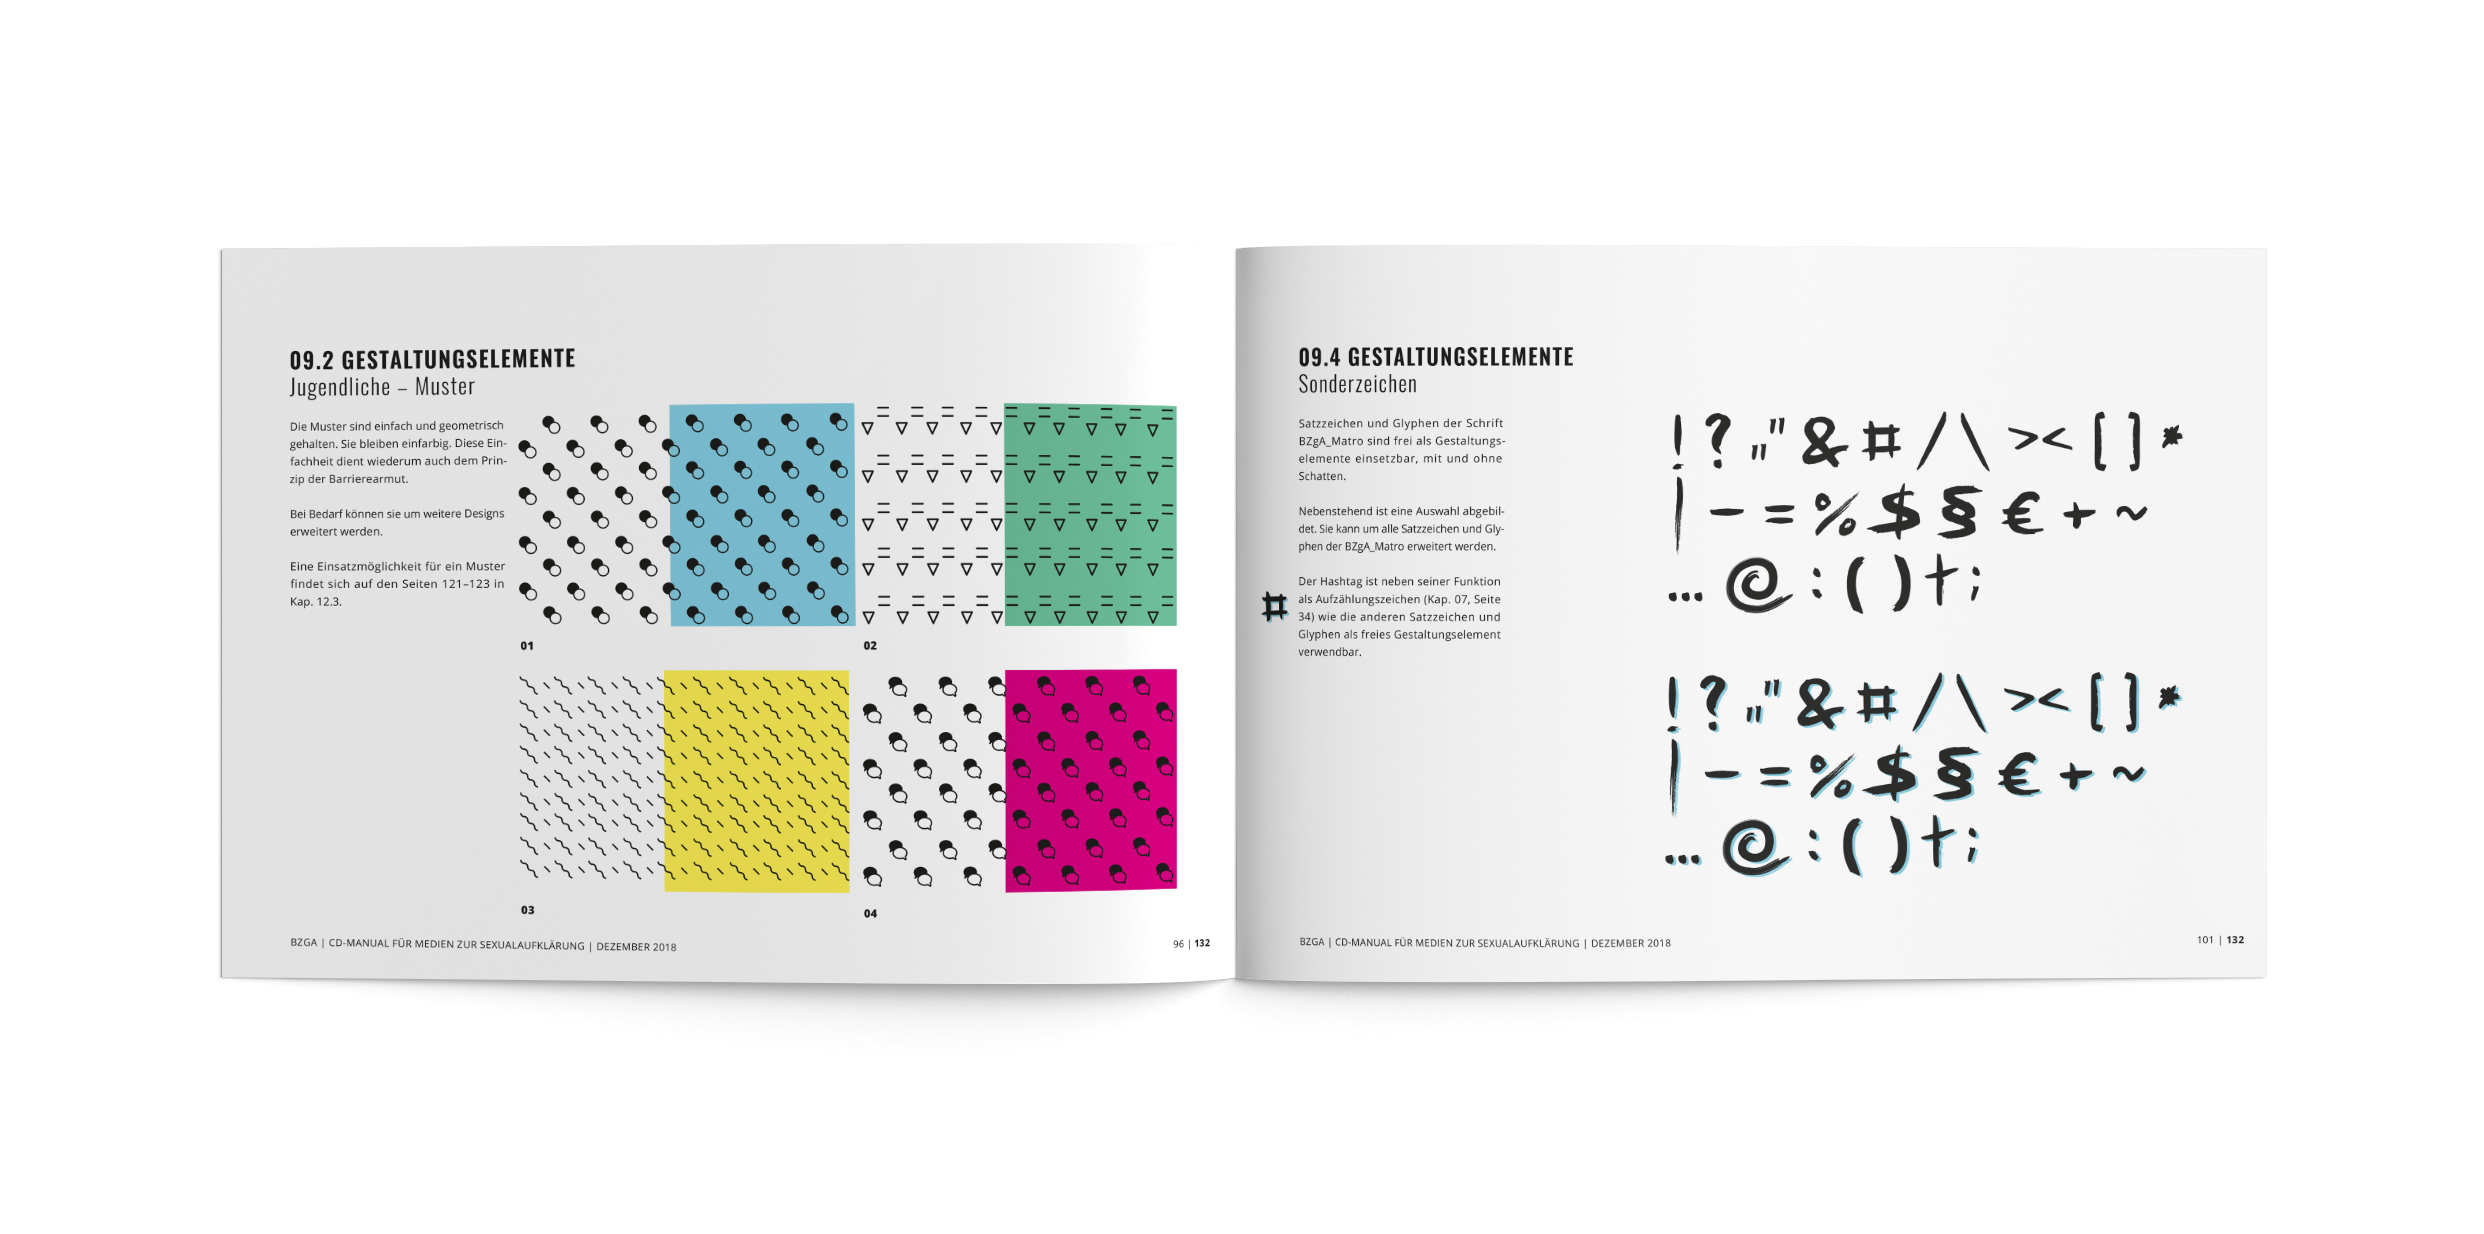 BZgA_Manual_Farben